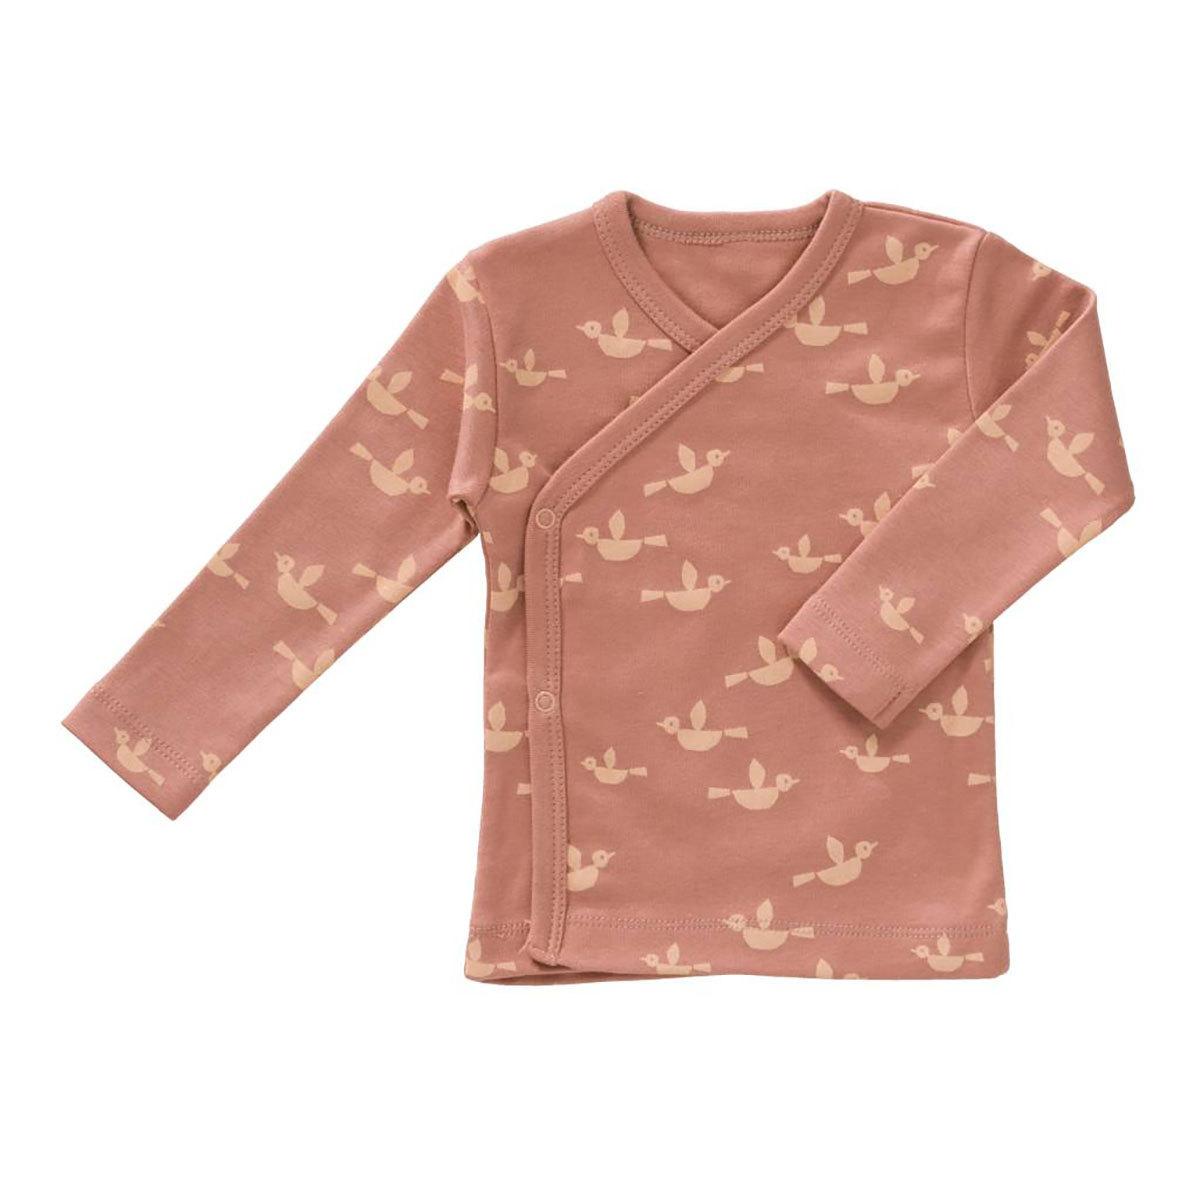 Body & Pyjama Cardigan Oiseaux - 0/3 Mois Cardigan Oiseaux - 0/3 Mois